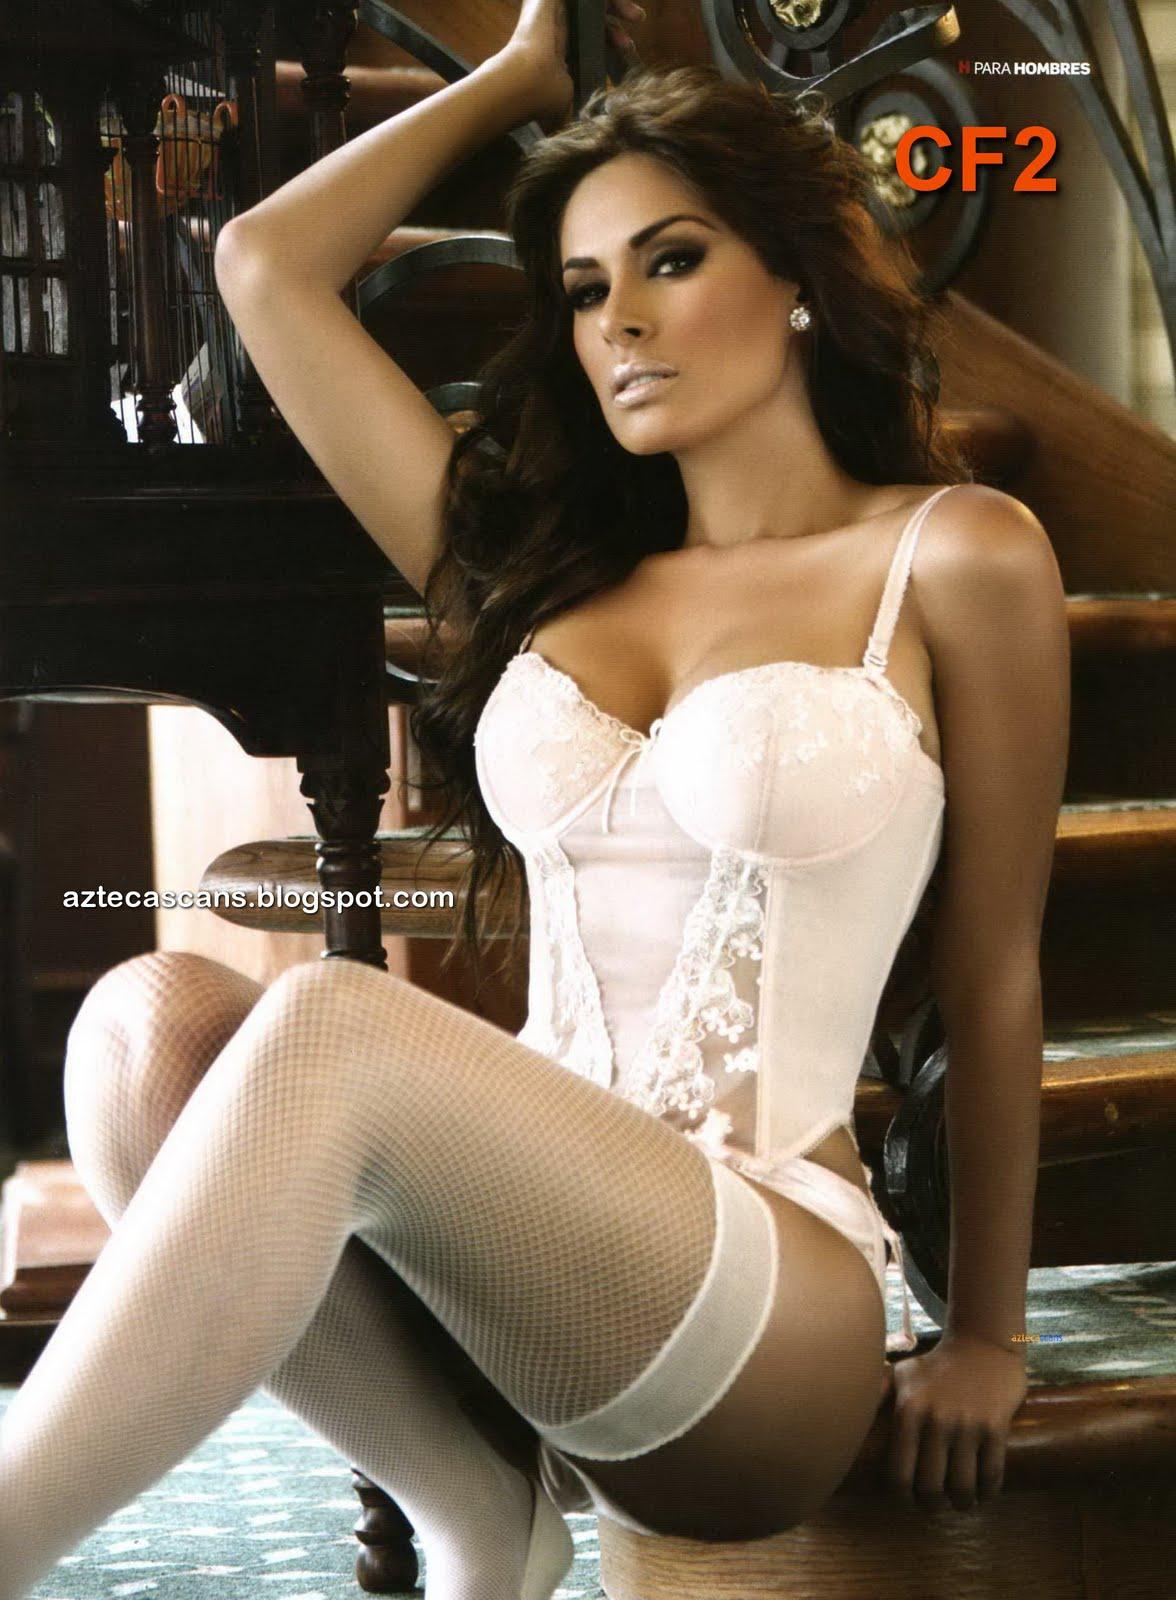 Pin Revista Extremo Liz Vega Image Search Results Ajilbabcom Portal on ...